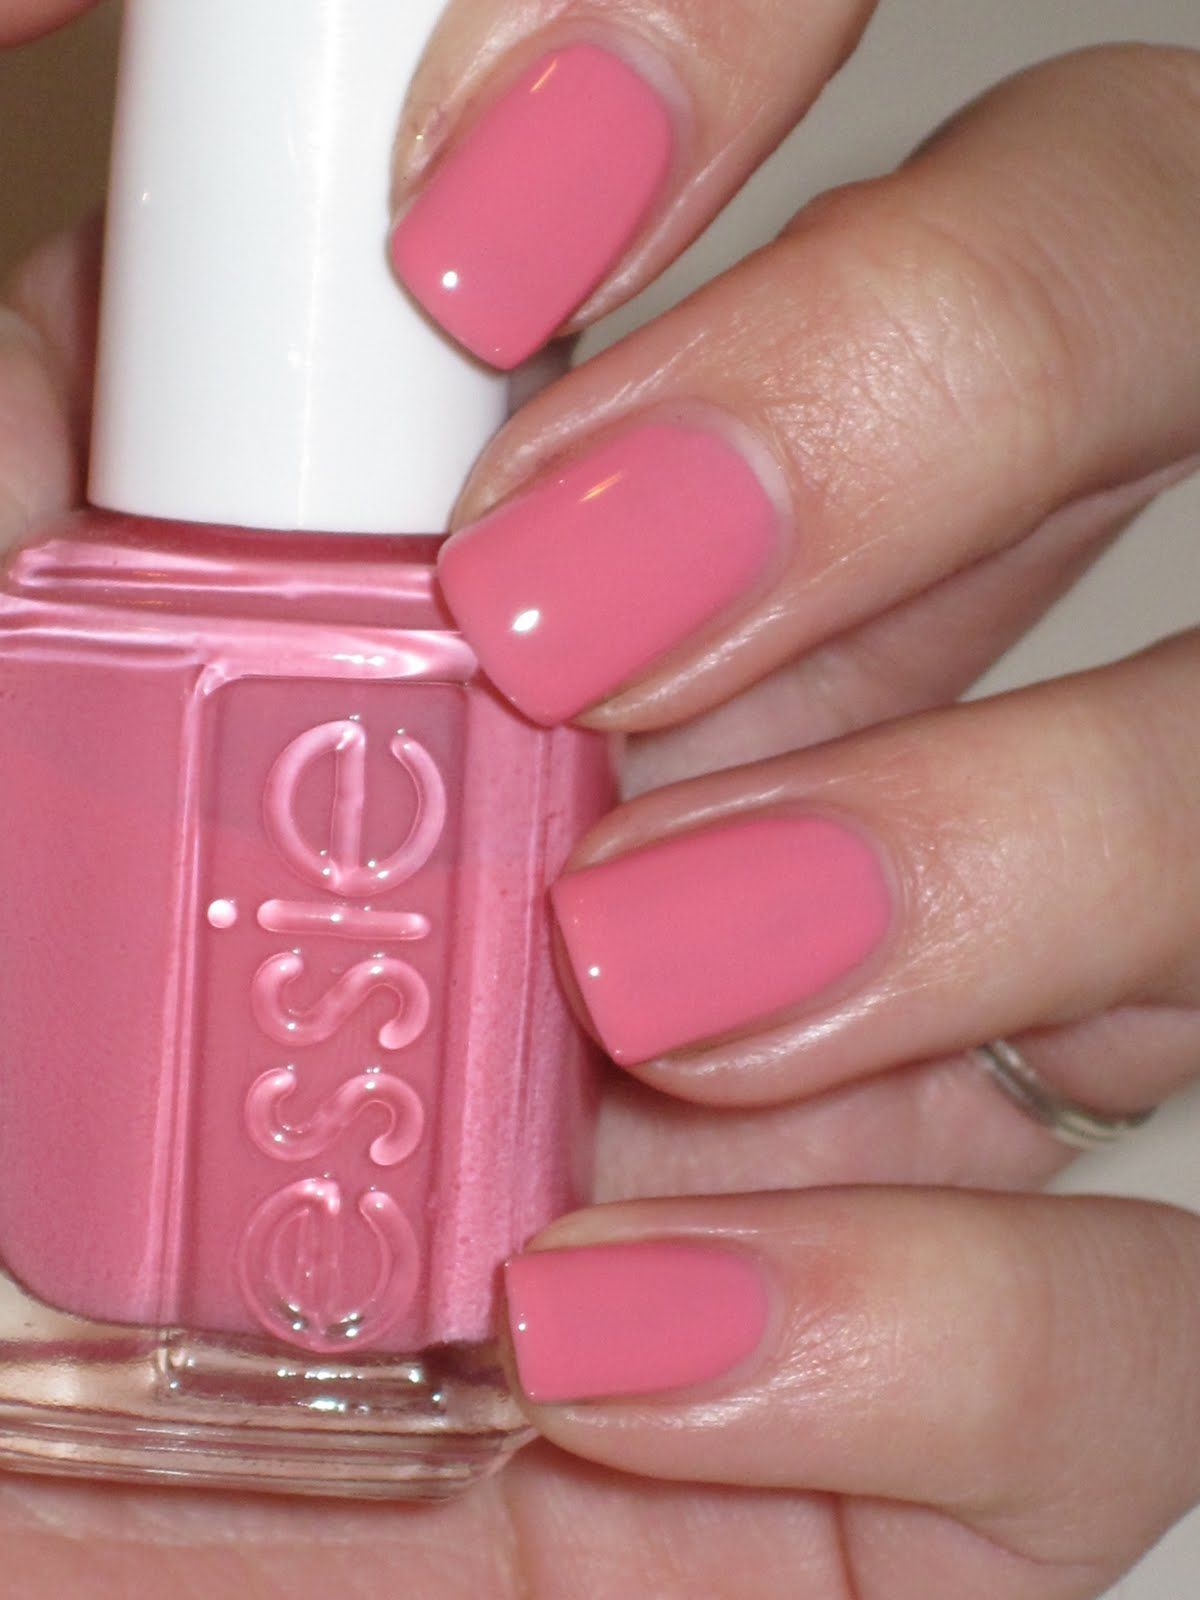 #nail #art #design nails art